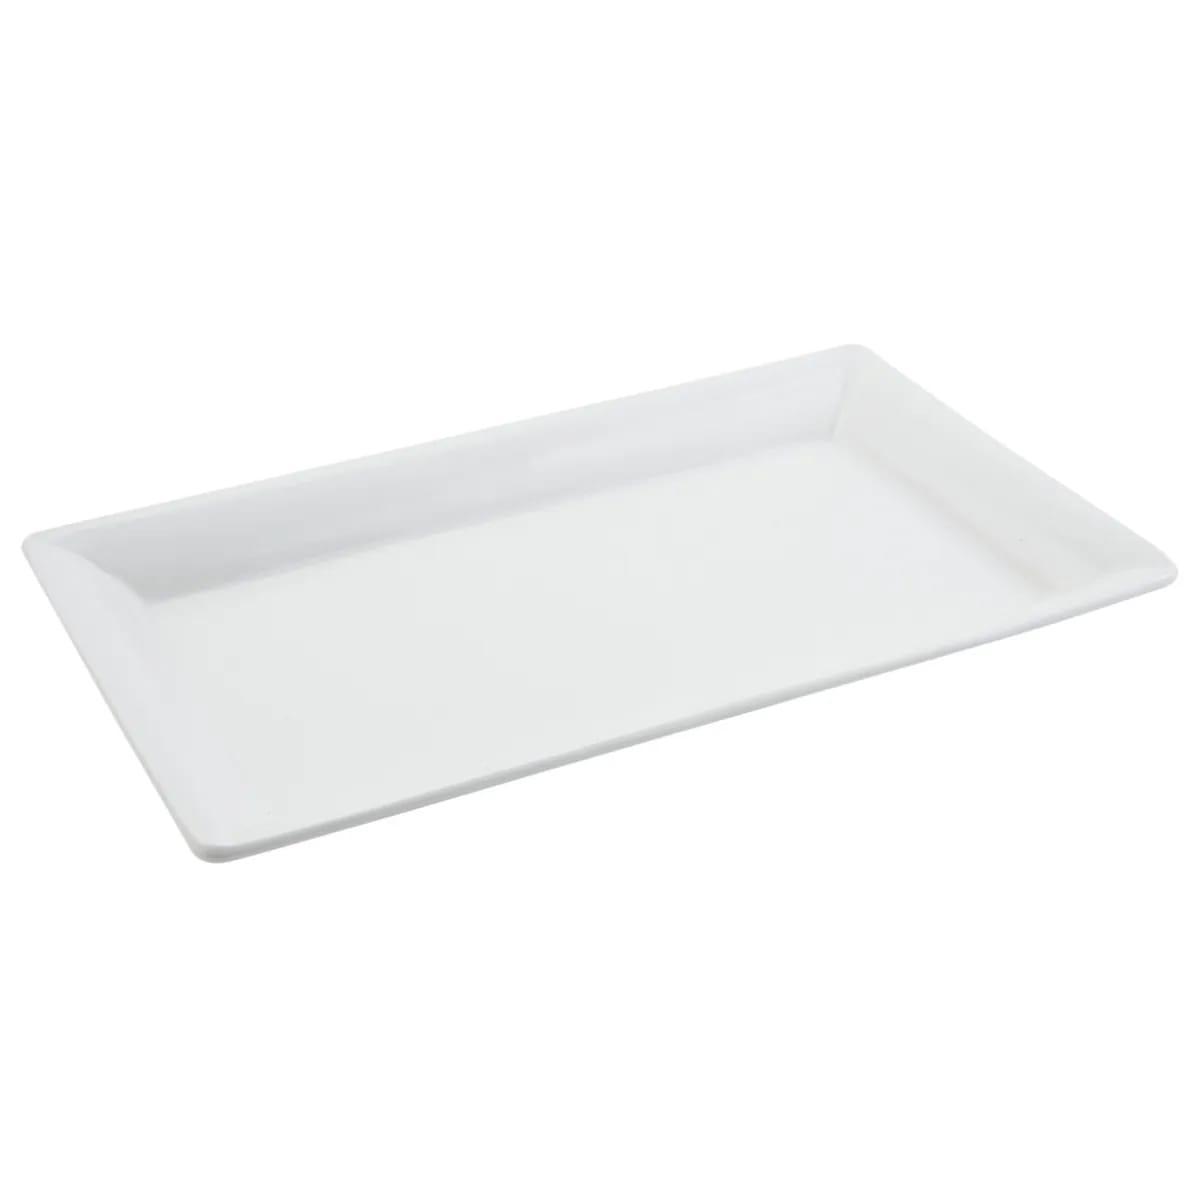 "Bon Chef 5057S Buffet Display Pan, 10 3/8 x 19 3/16"", Aluminum/White"